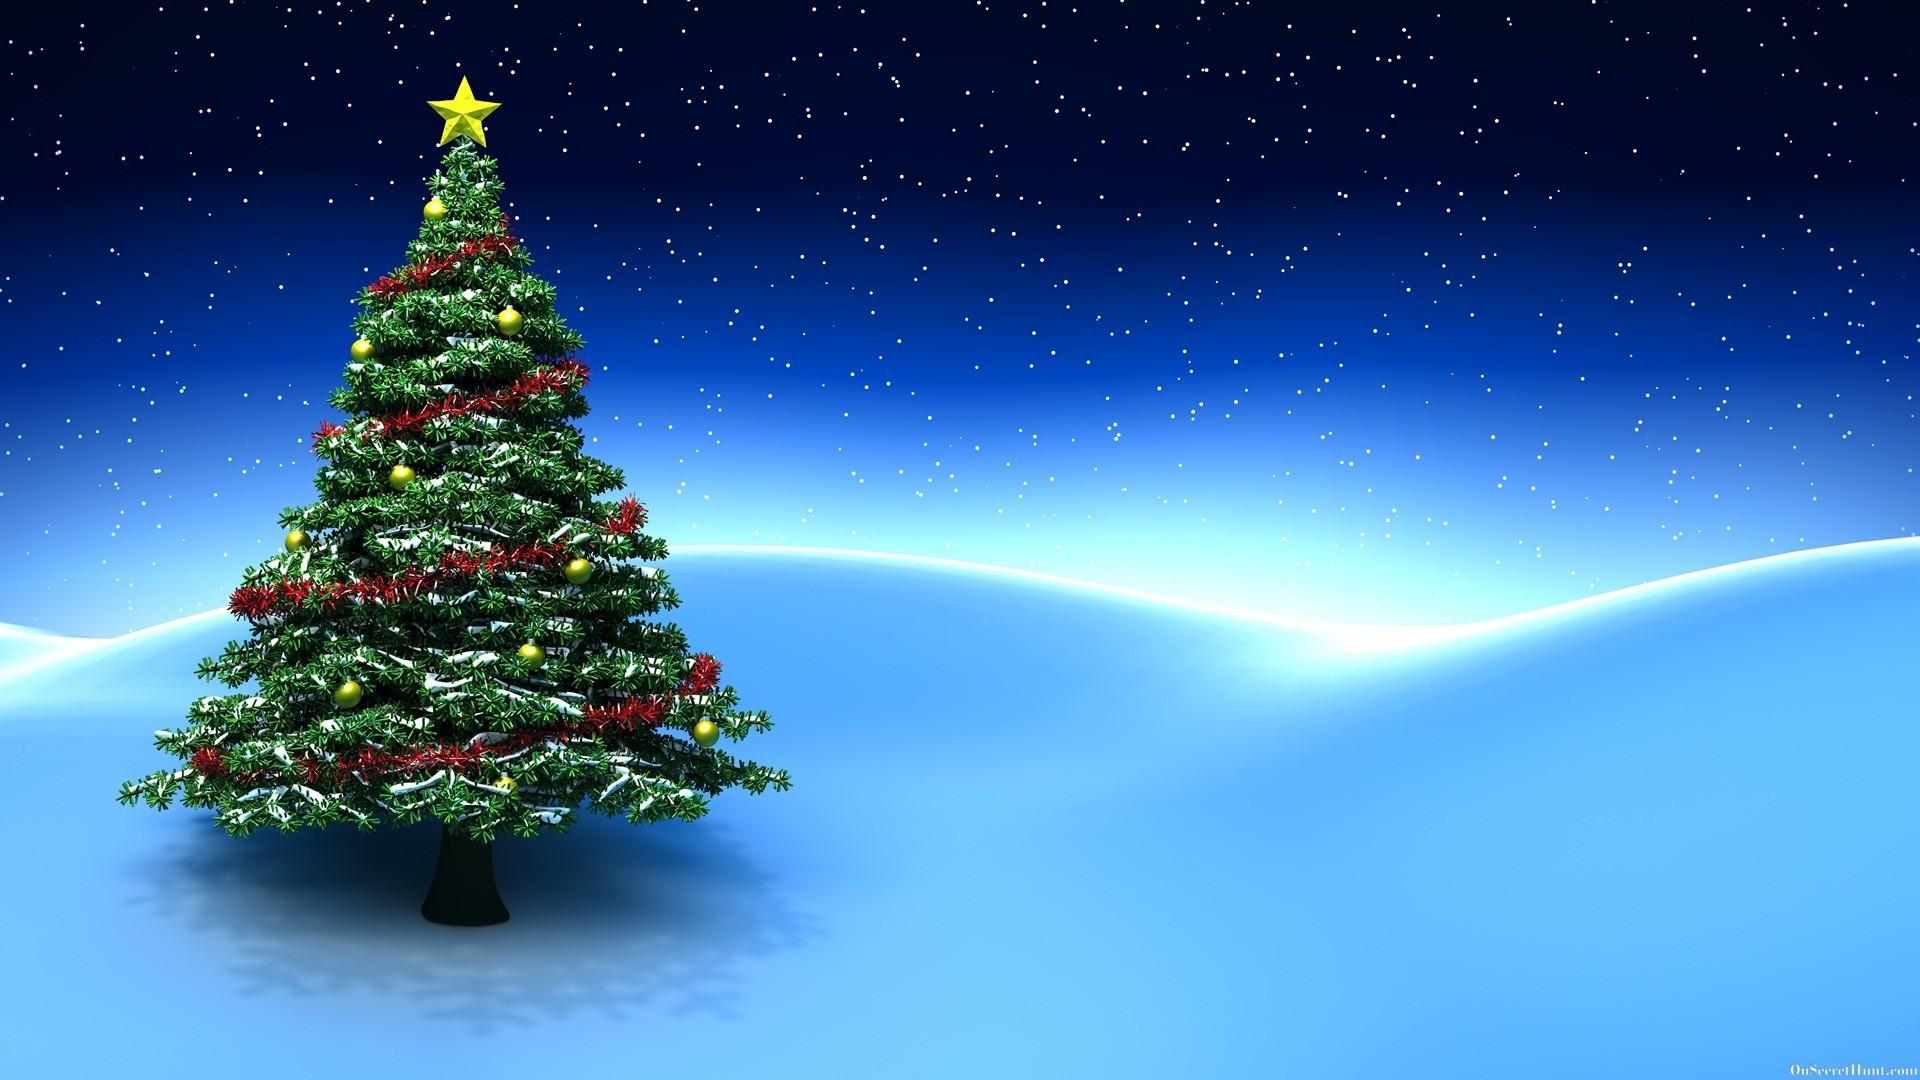 Beautiful Christmas Background Images.Beautiful Christmas Backgrounds Wallpapertag